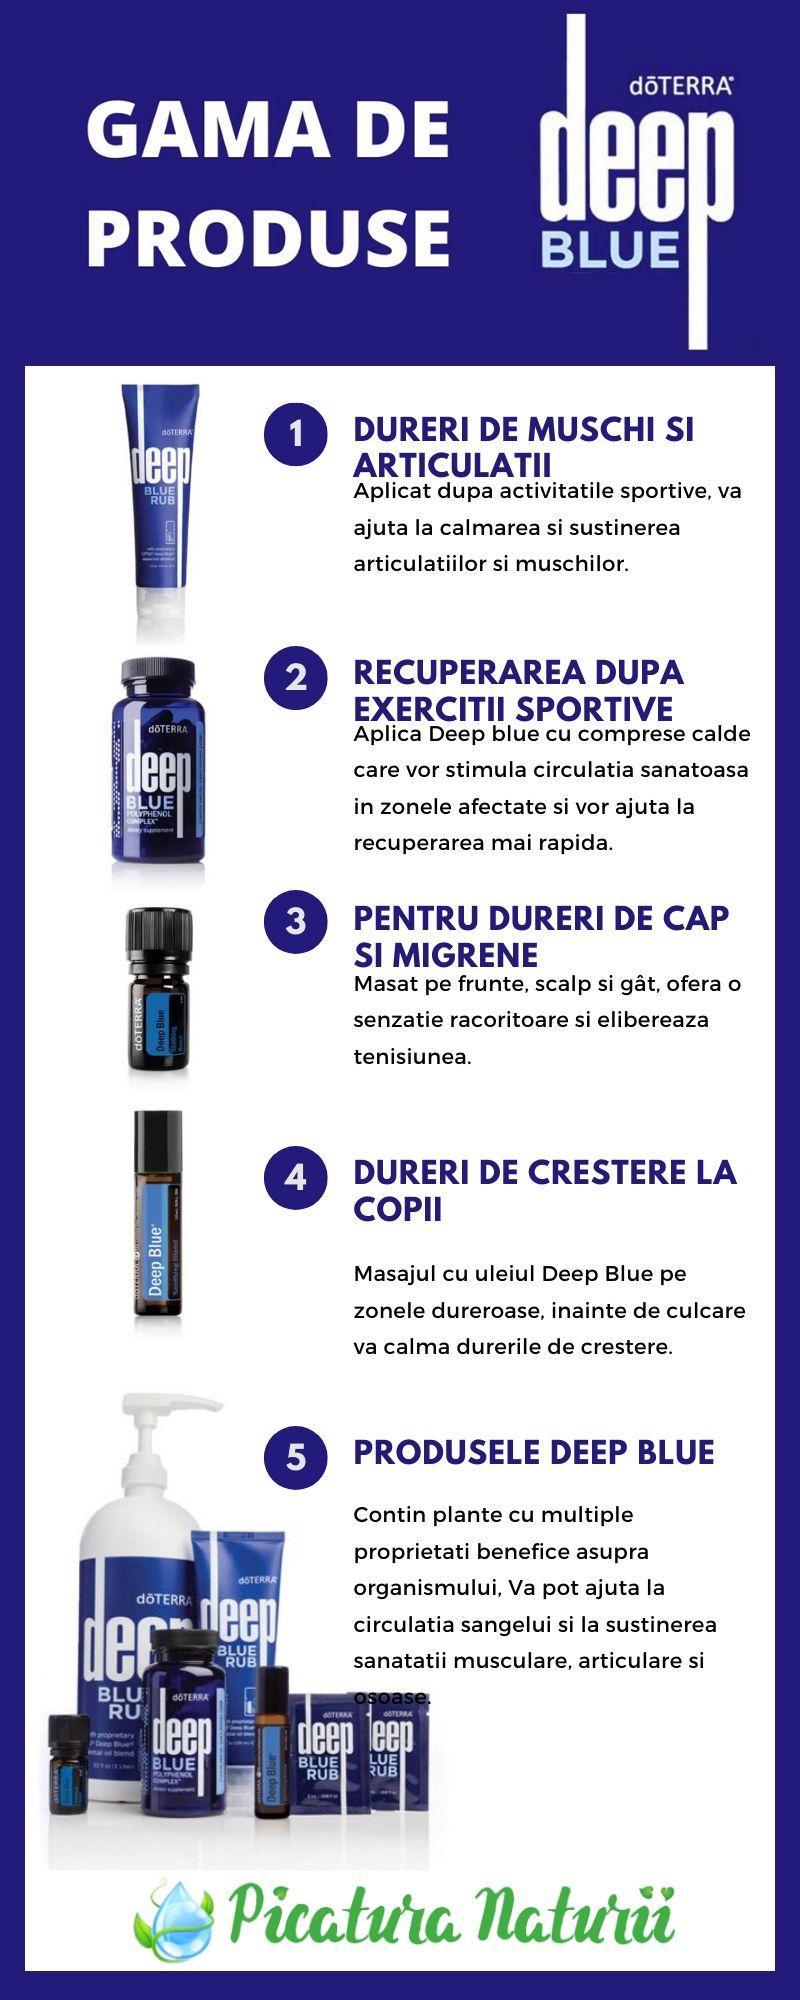 Produse Deep Blue doTerra